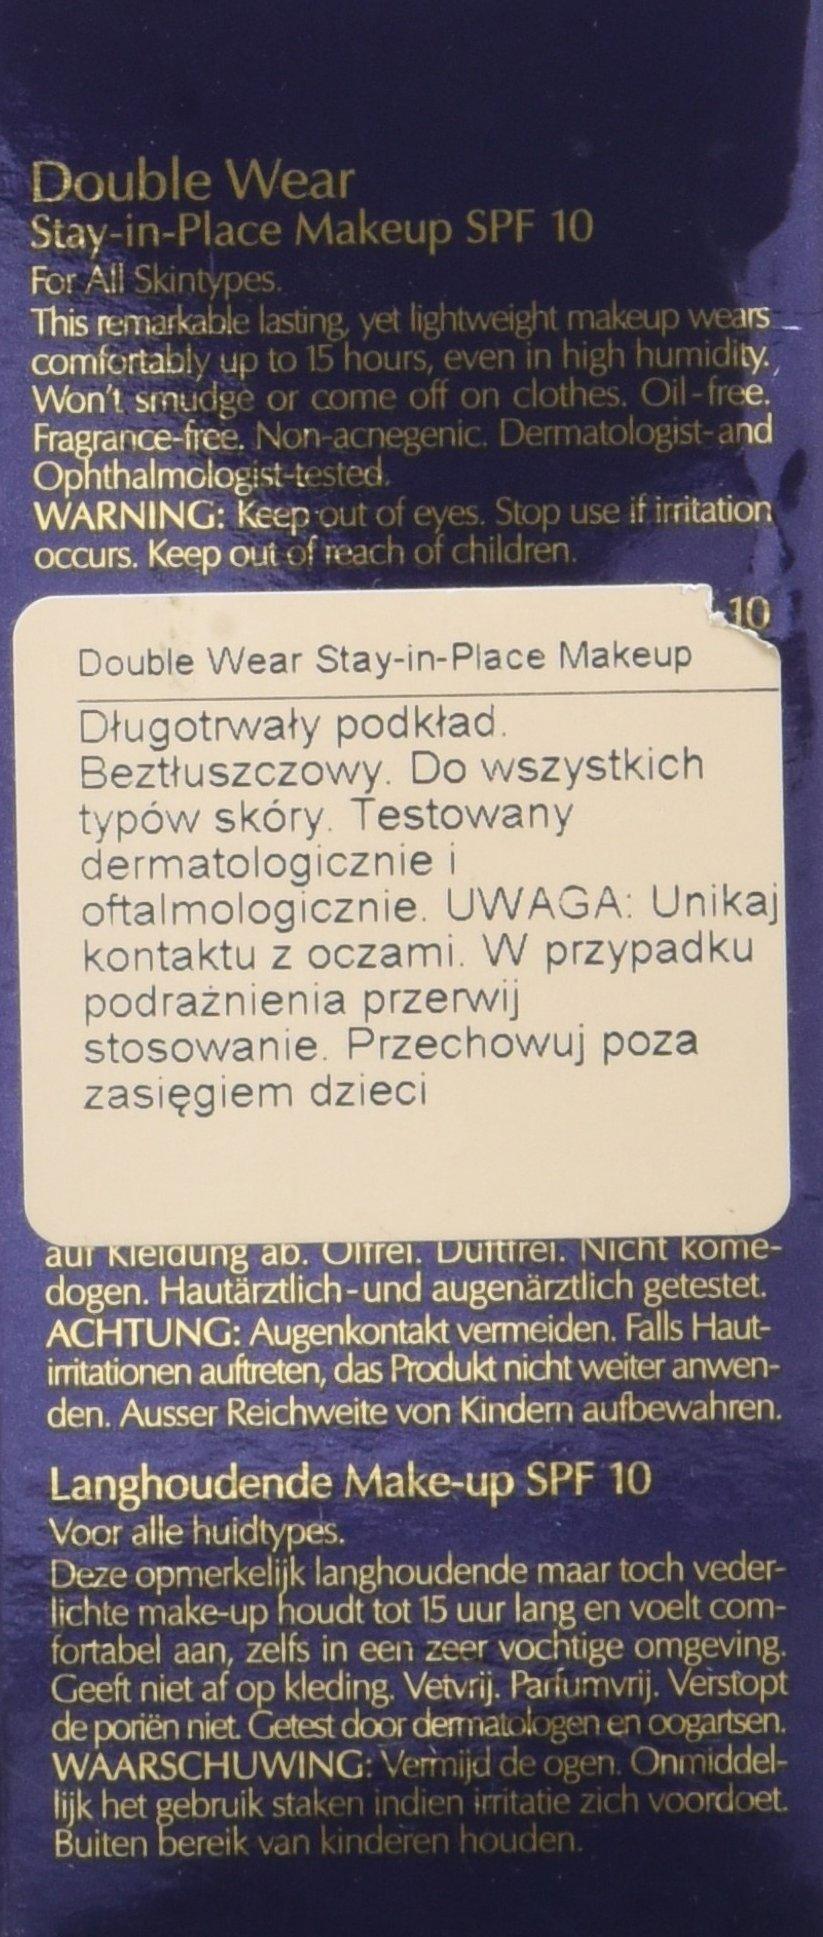 Estée Lauder Double Wear Stay-In-Place Makeup – Maquillaje de base FPS 10 Sandbar Beige